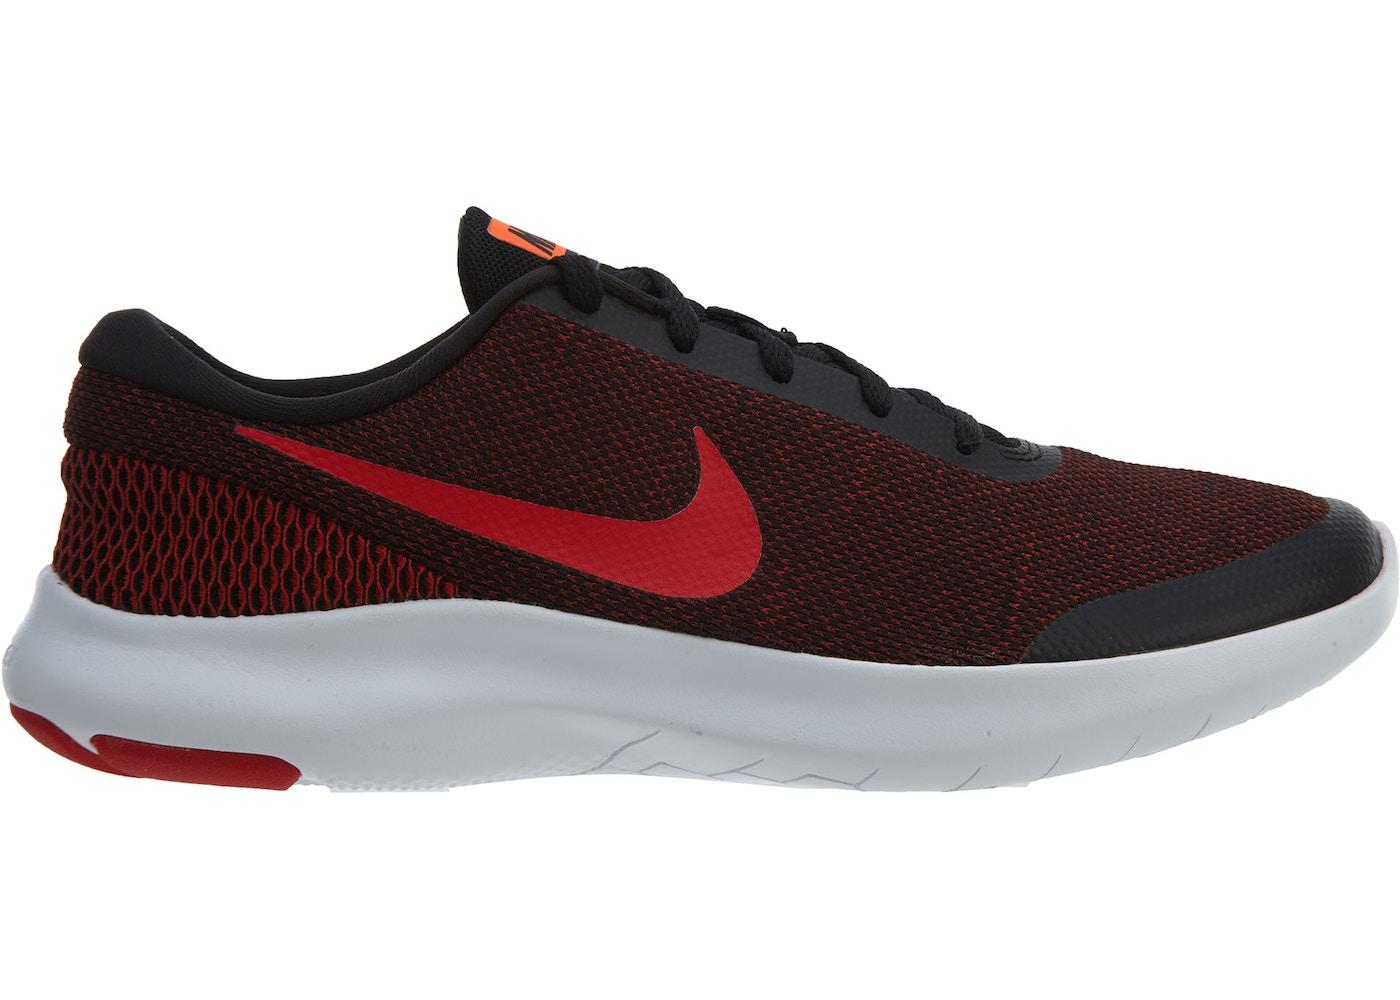 04c71e2892b43 ... Nike Flex Experience Rn 7 Black University Red-Gym Red ...